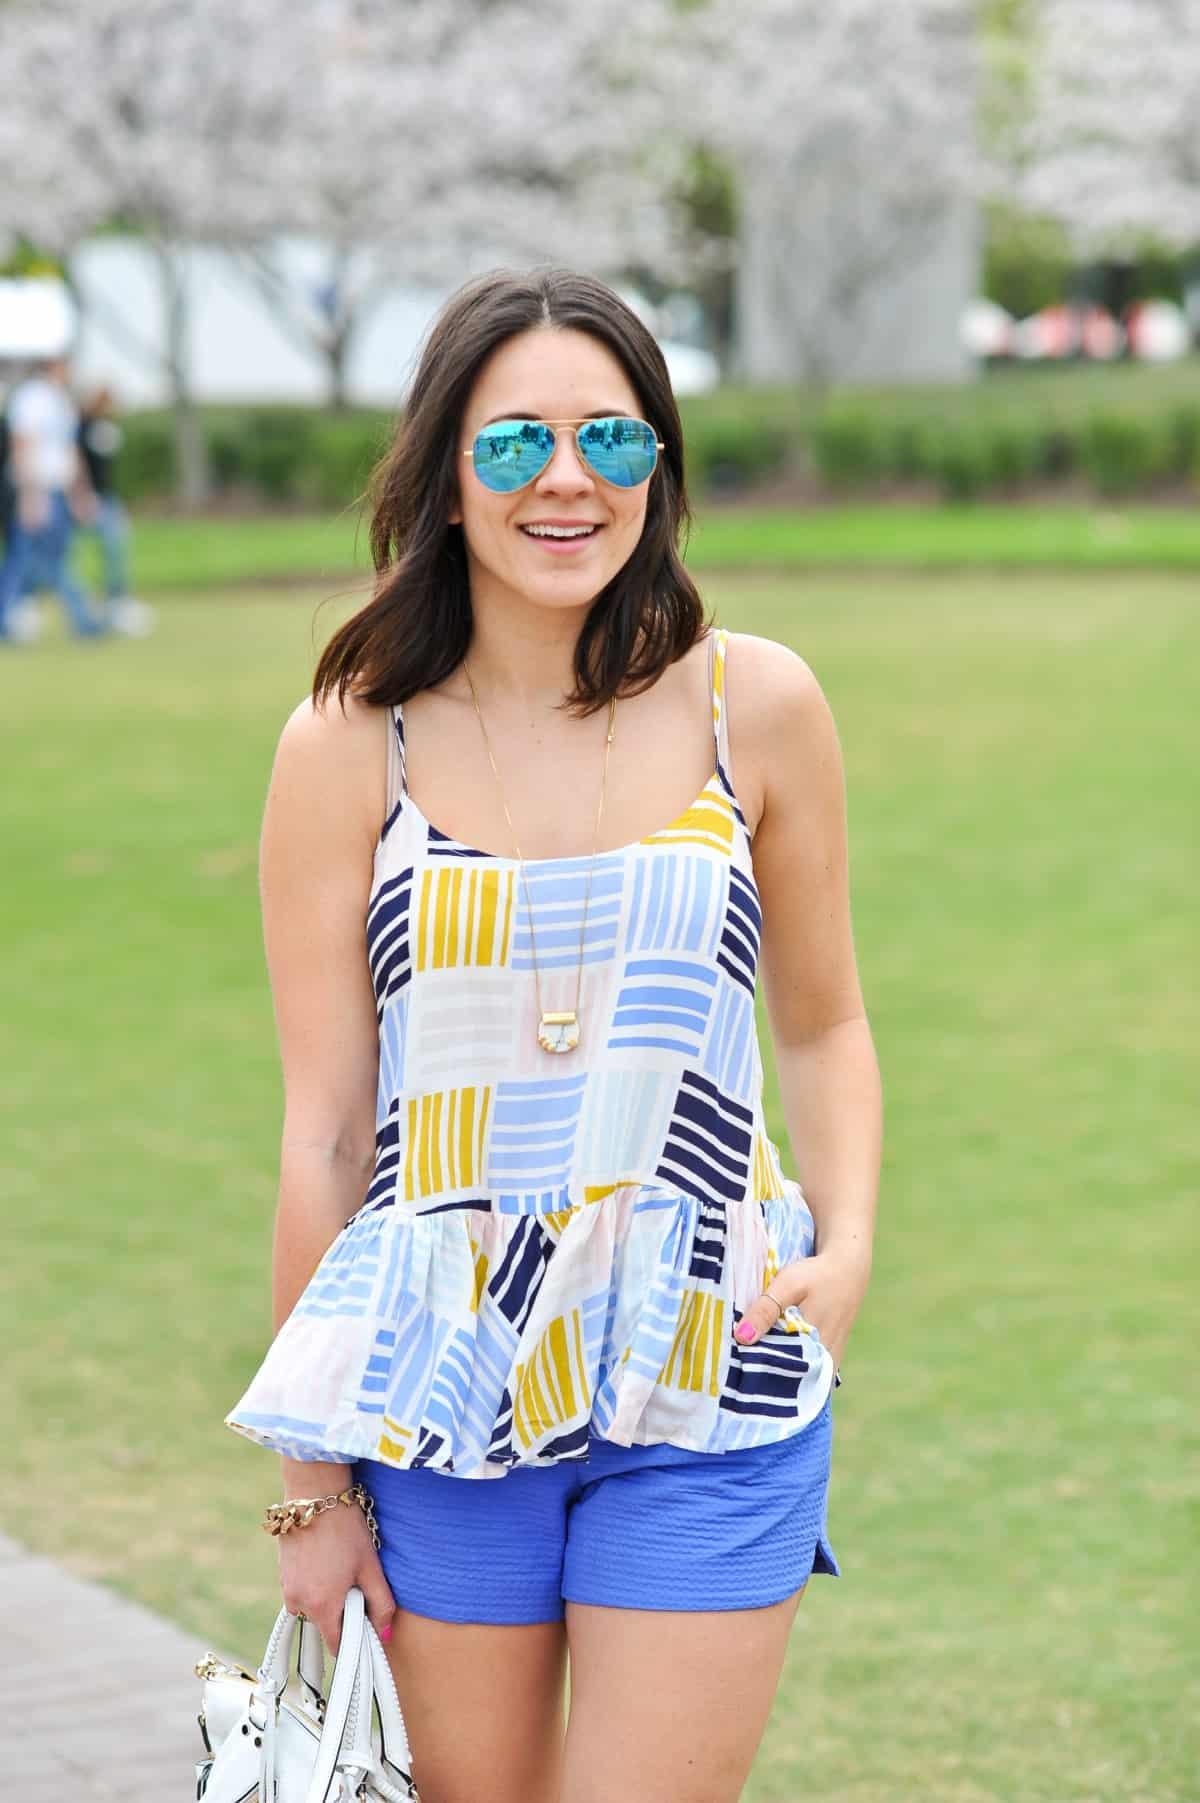 Old Navy printed peplum tank - summer outfit ideas - My Style Vita - @mystylevita - 17